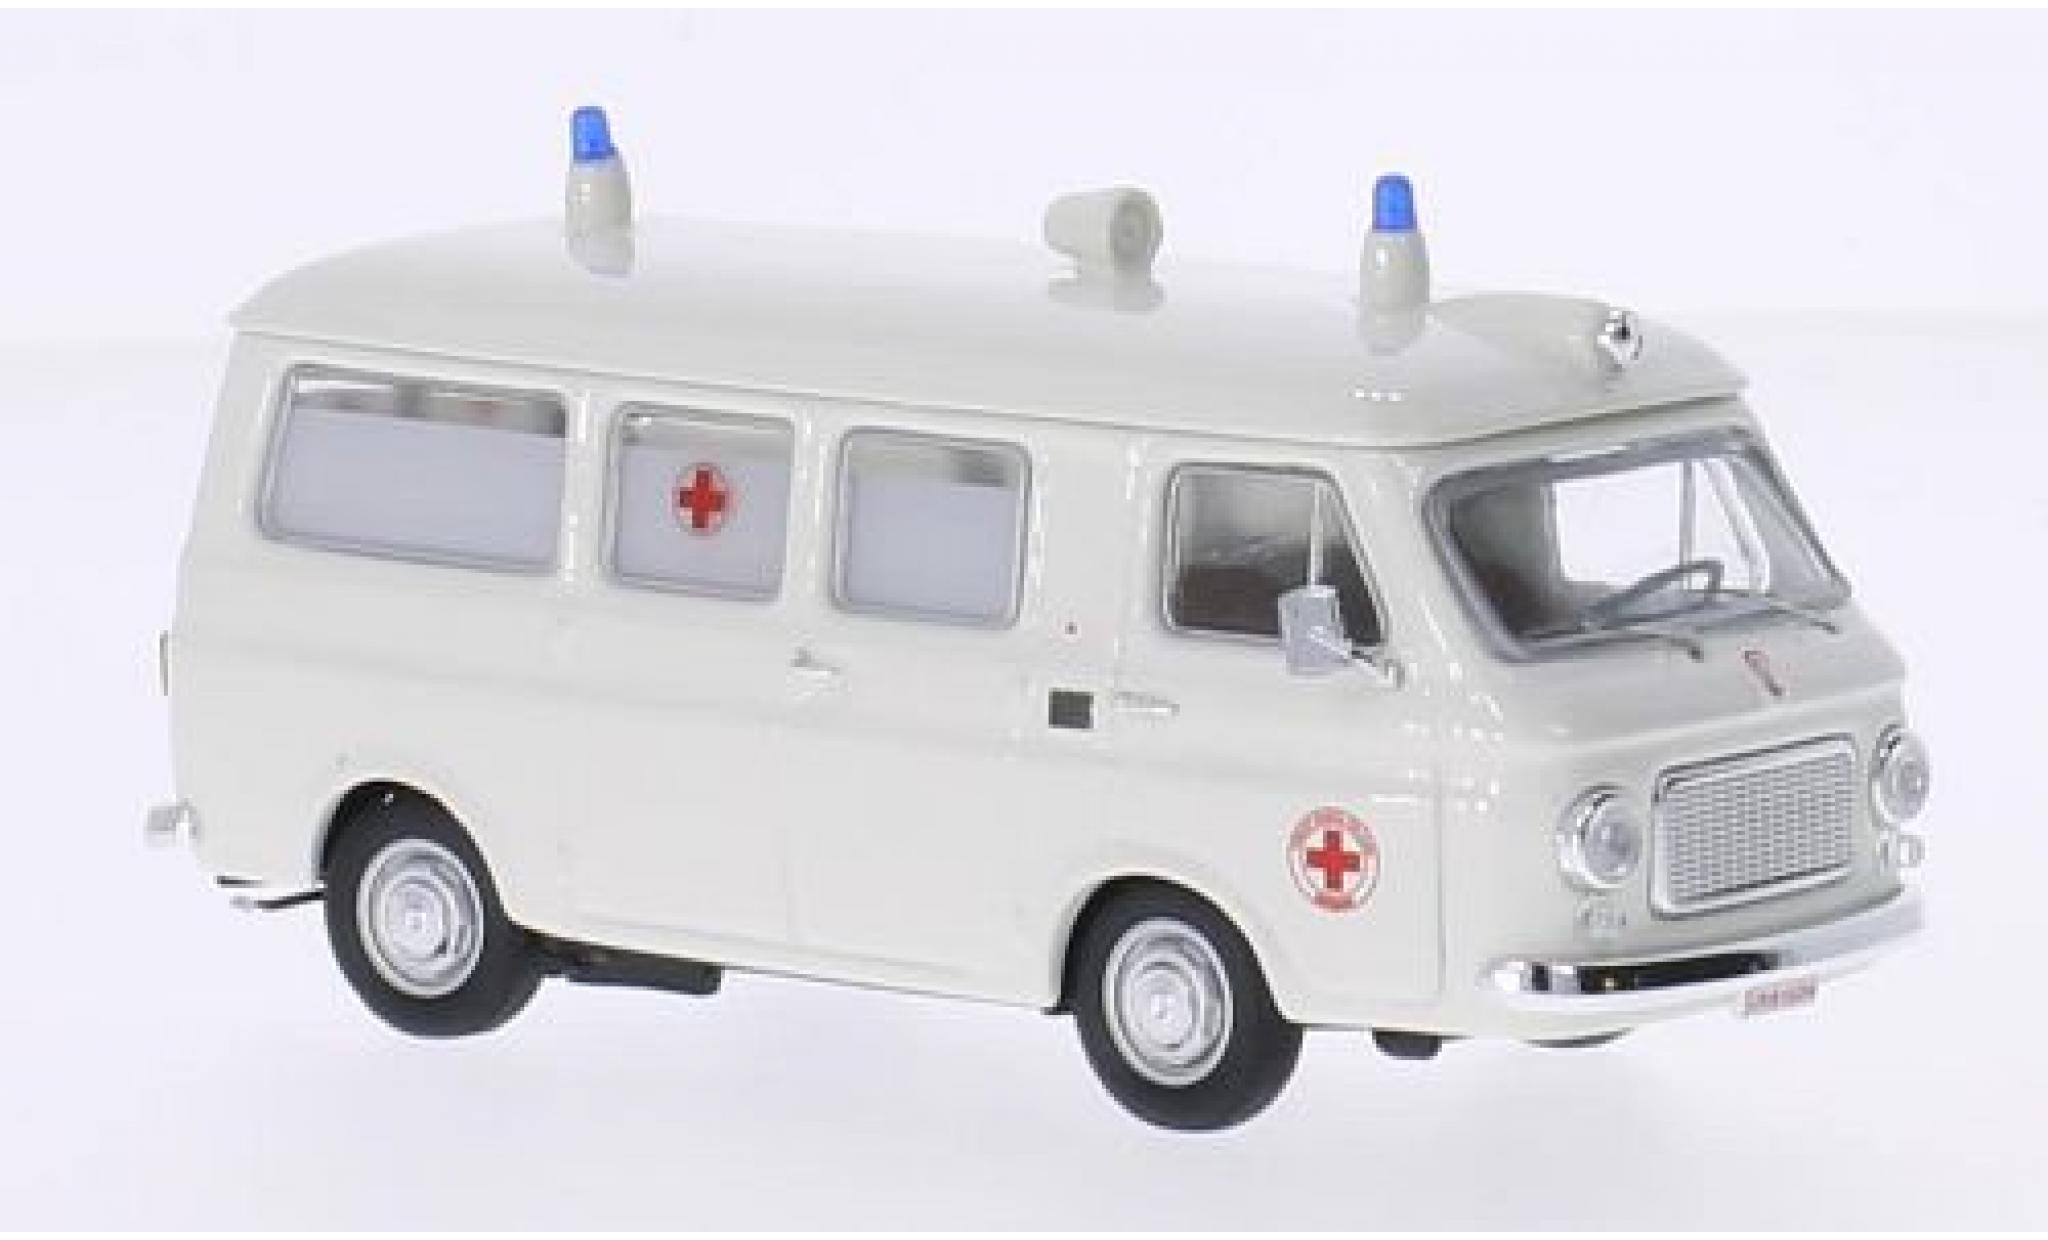 Fiat 238 1/43 Rio Croce Rossa Italiana - Bergamo Ambulance (I)